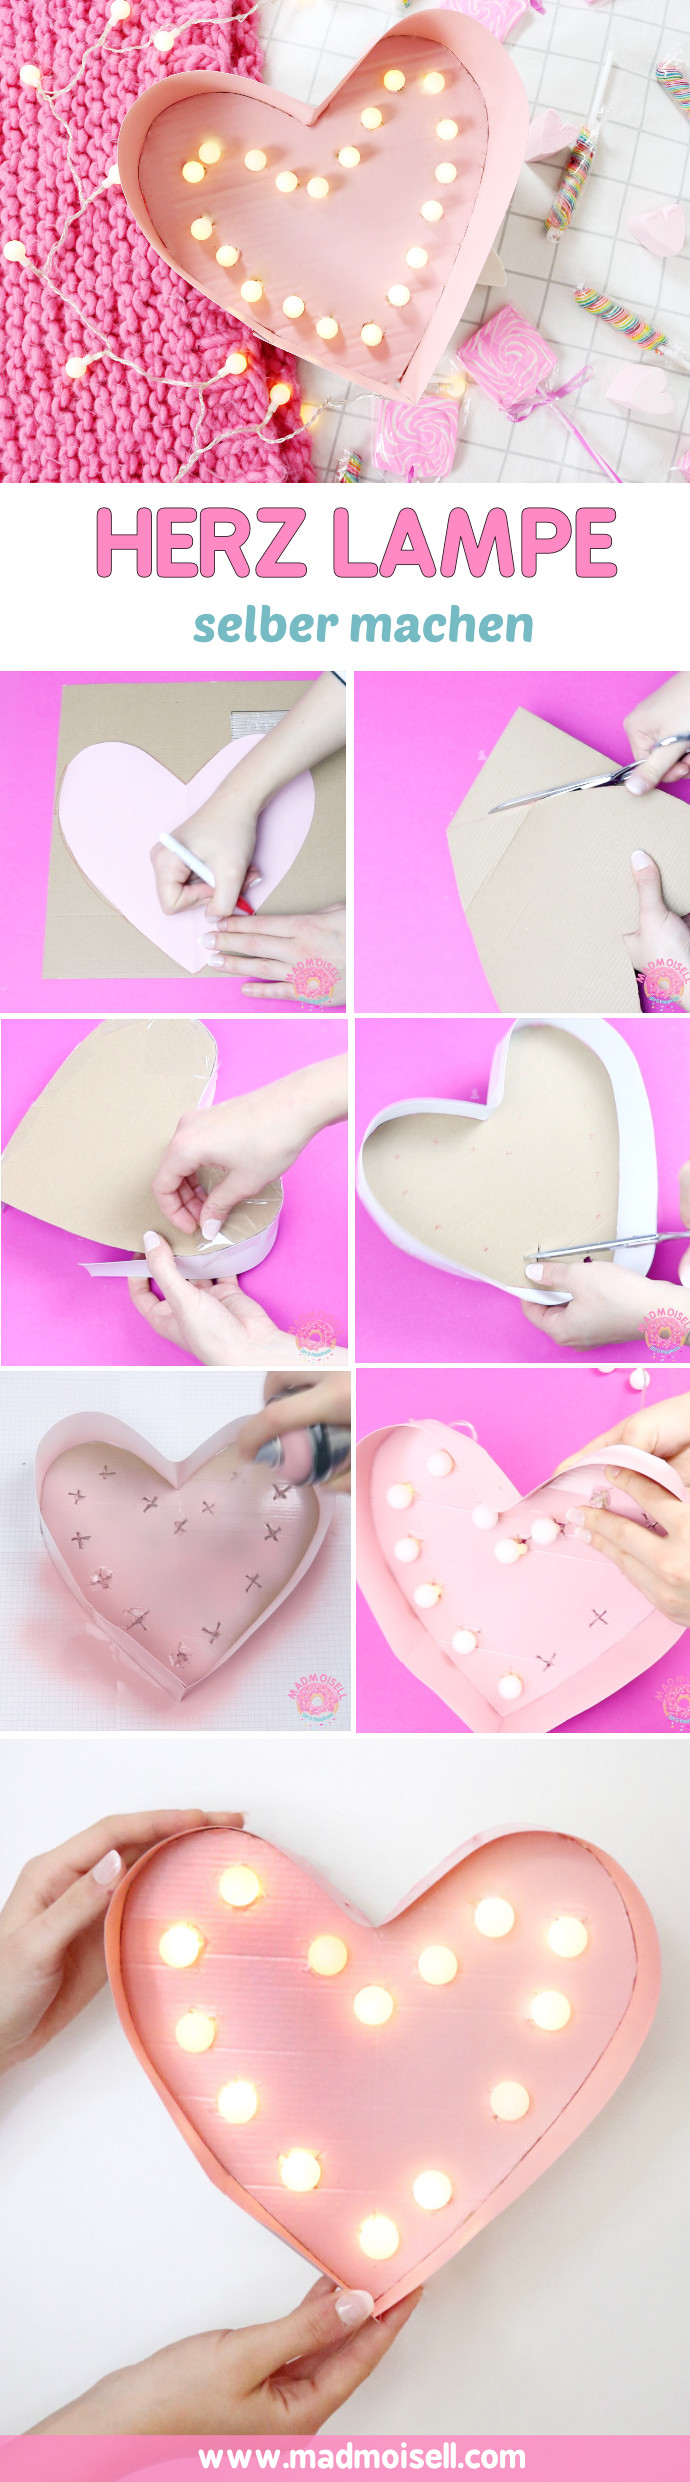 DIY Lampe in Herzform selber machen – Kreative DIY Deko Idee